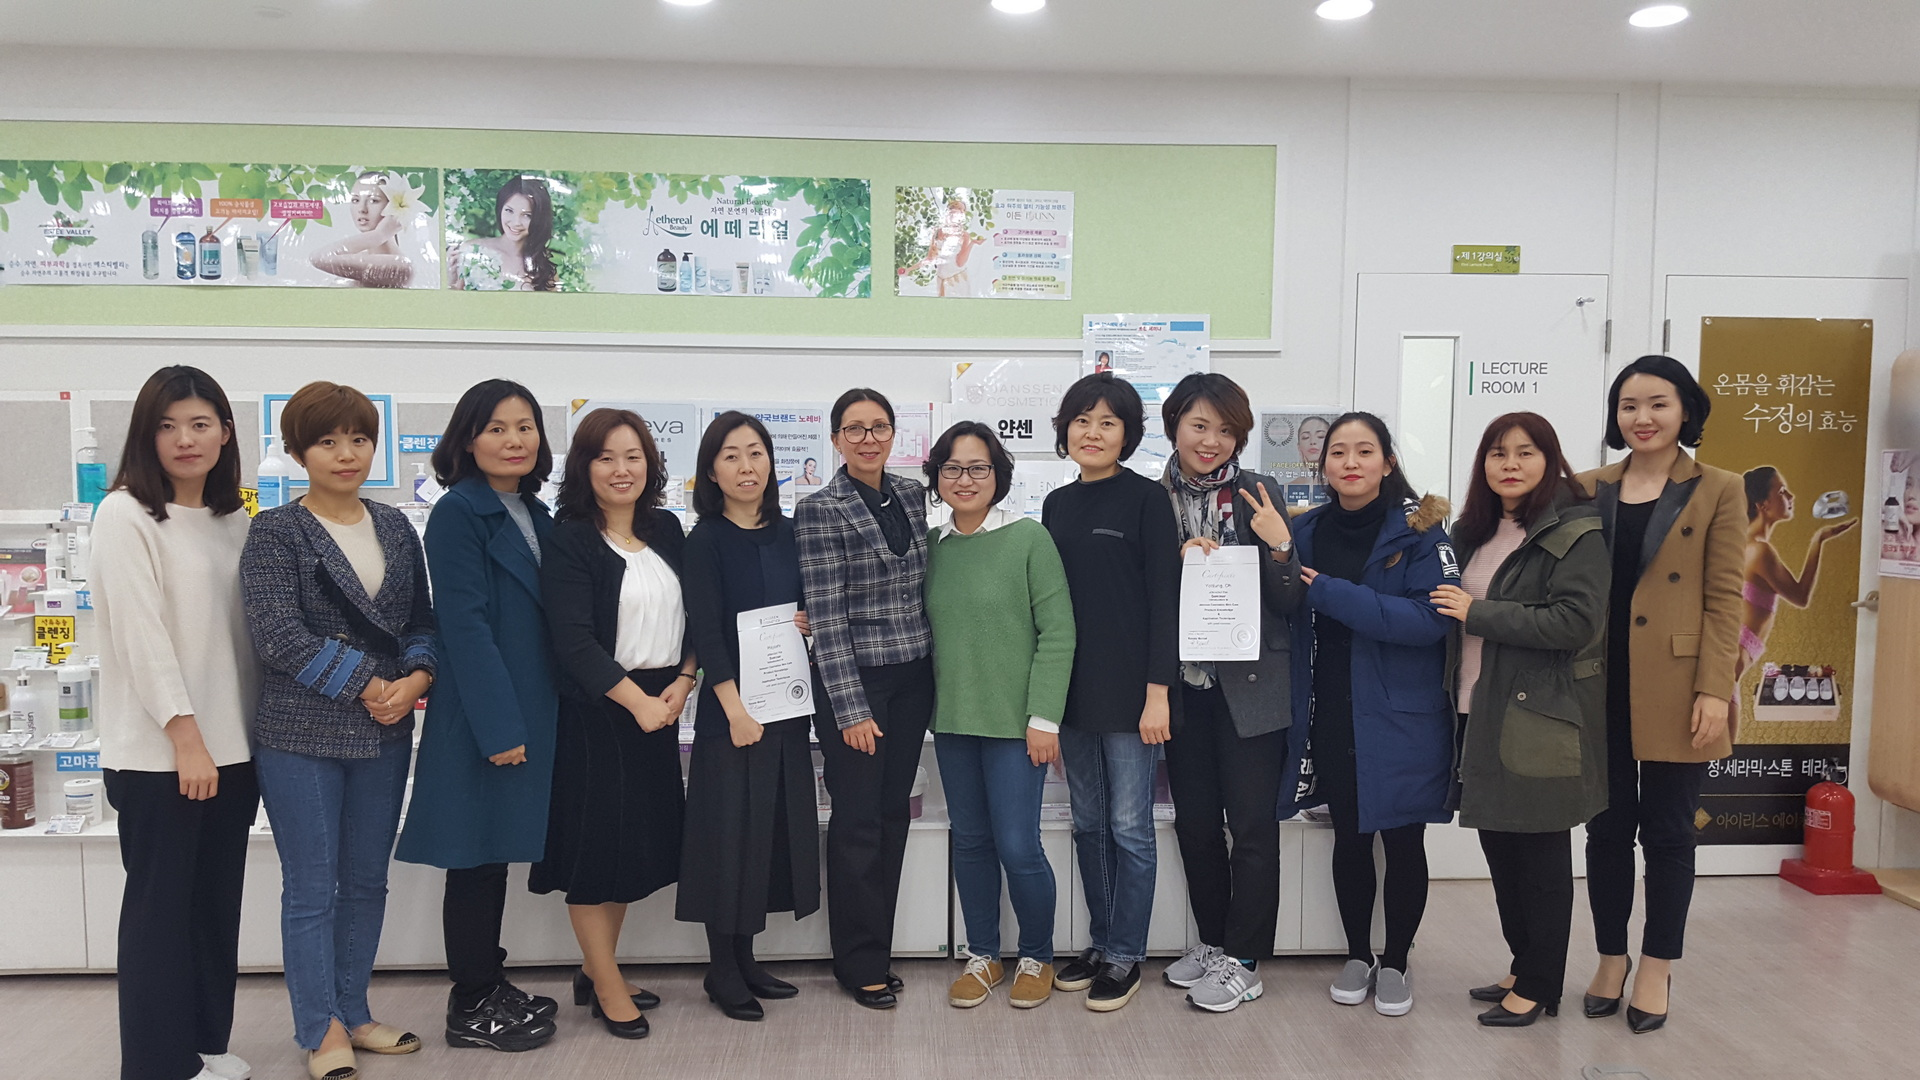 Seminarteilnehmer in Seoul 2016